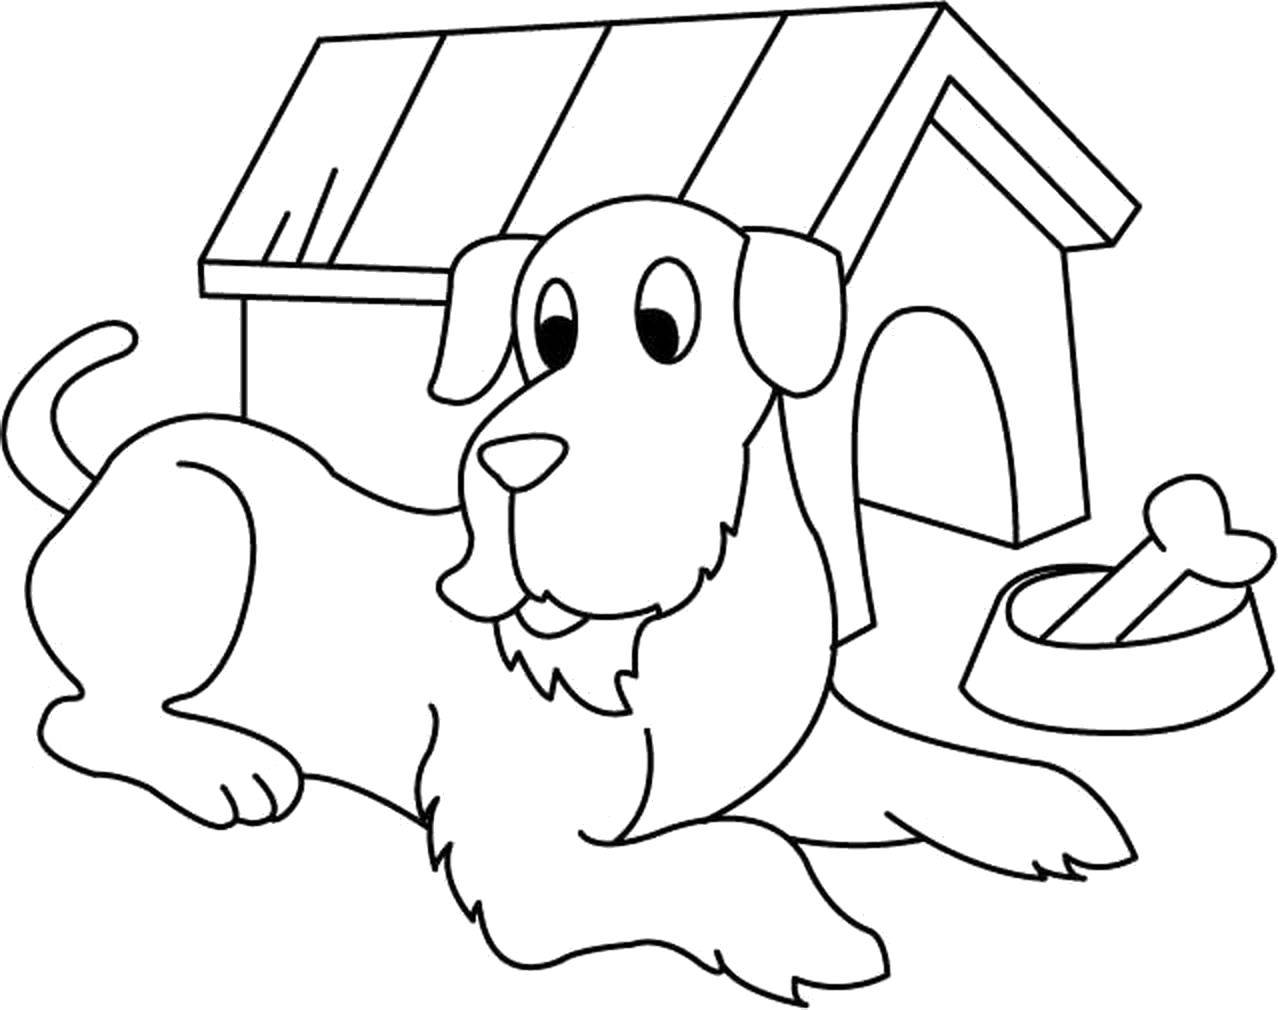 Собака с будкой